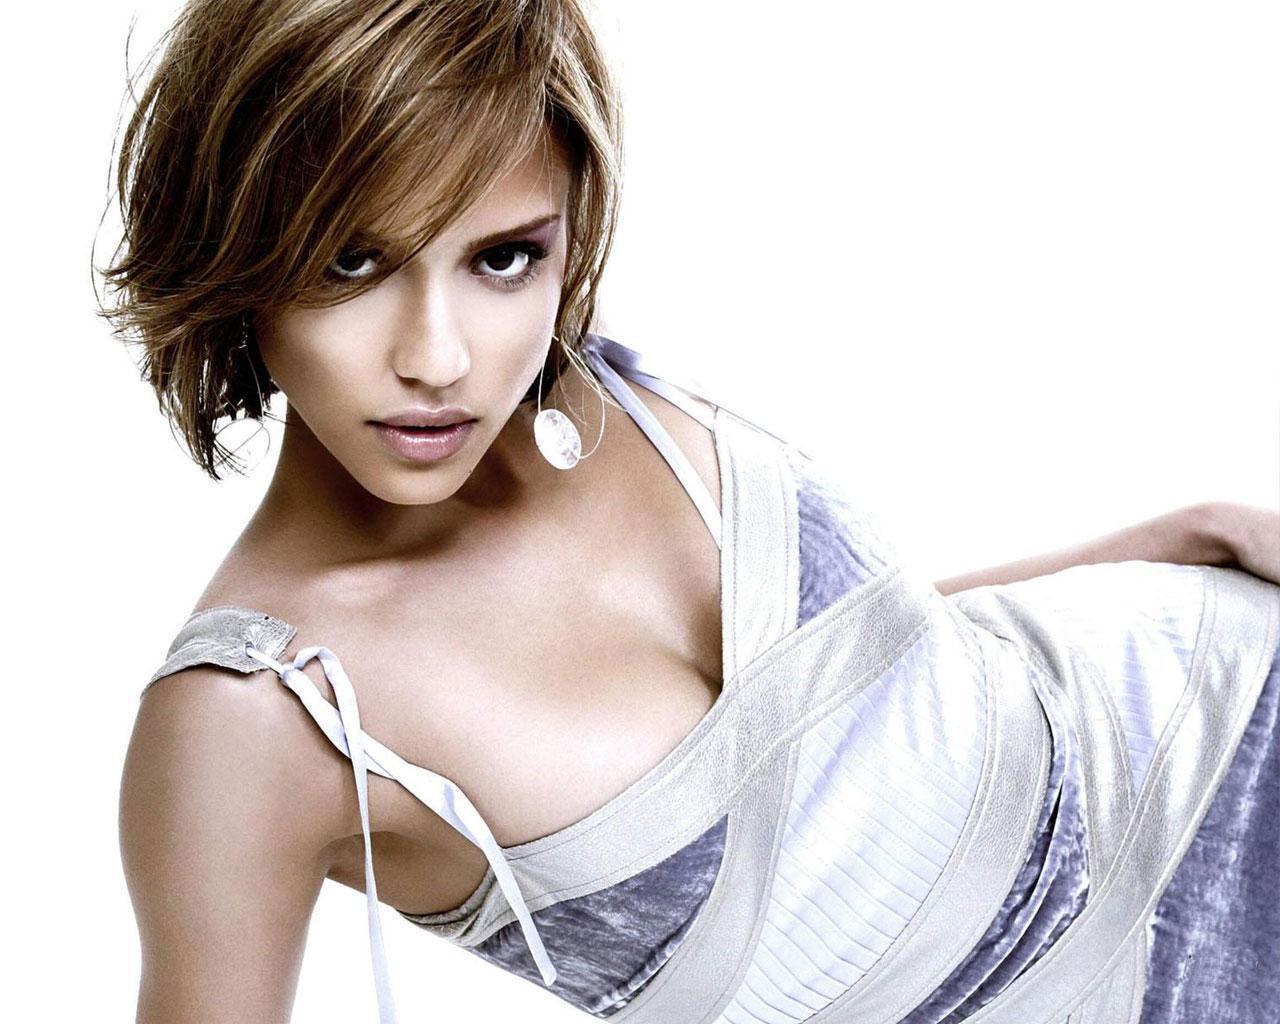 Best looking woman - Jessica Alba - 1280x1024 Wallpaper #2 : クール ... Jessica Alba